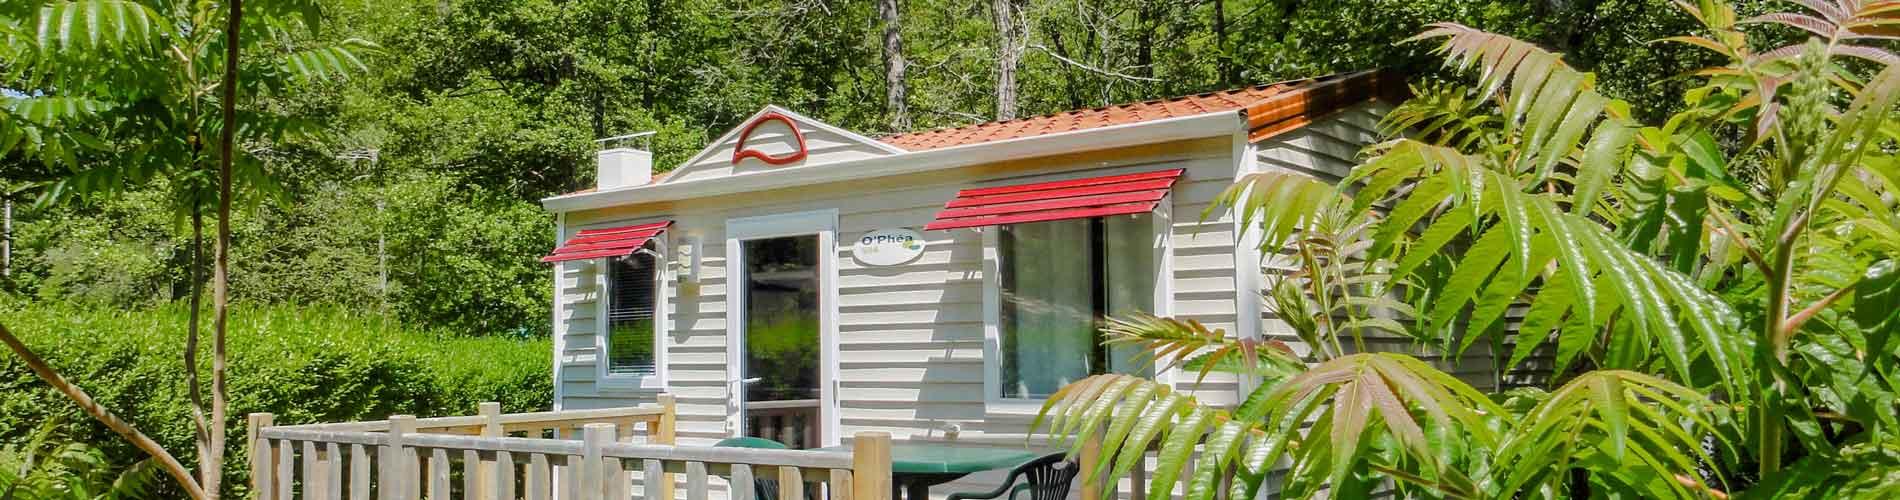 location mobil home familial en Dordogne